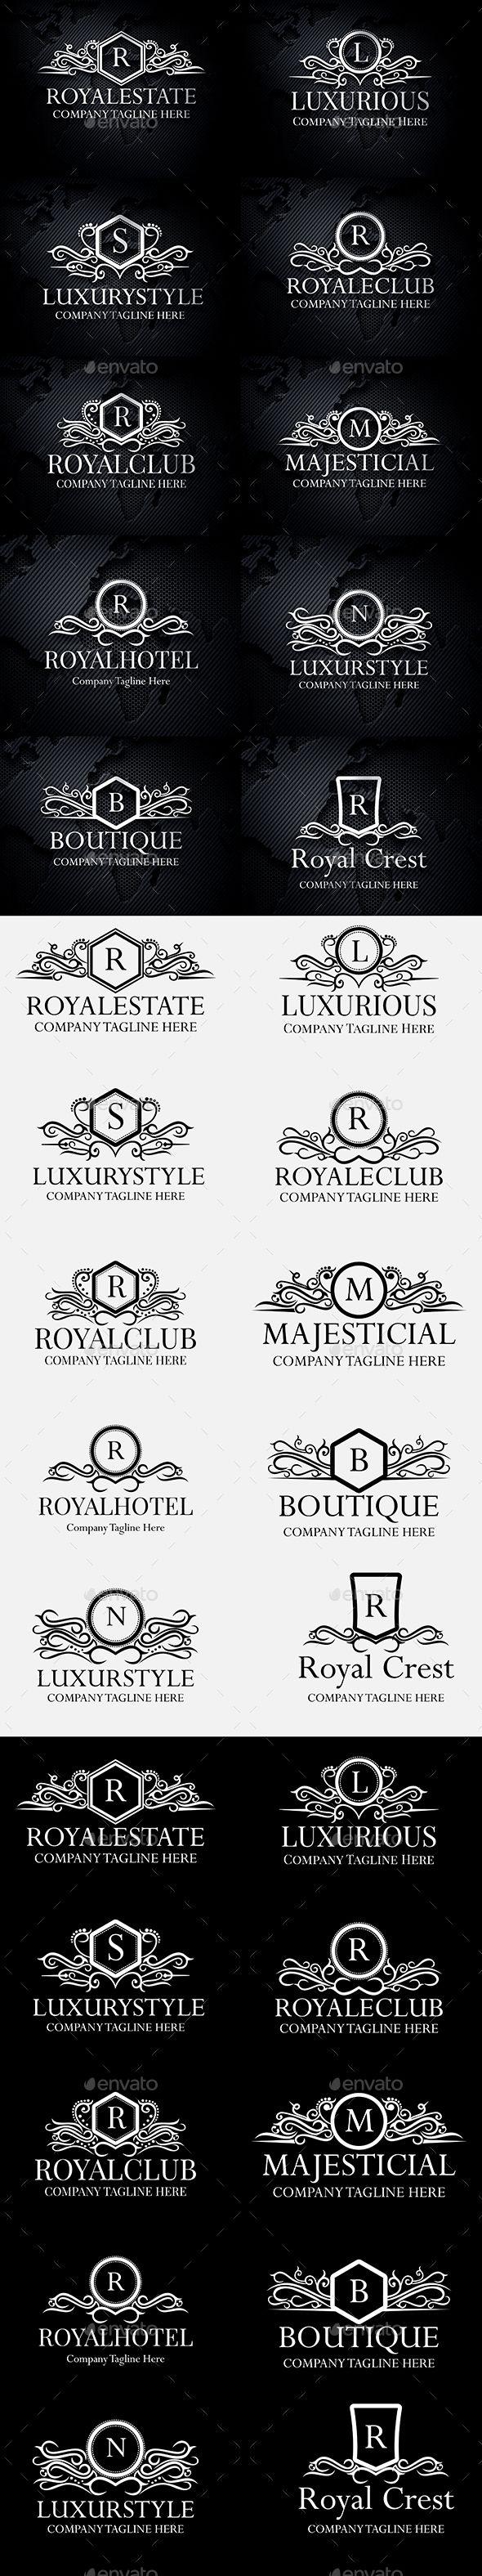 Heraldic Royal Luxurious Crest Logos Template Vector EPS, AI Illustrator